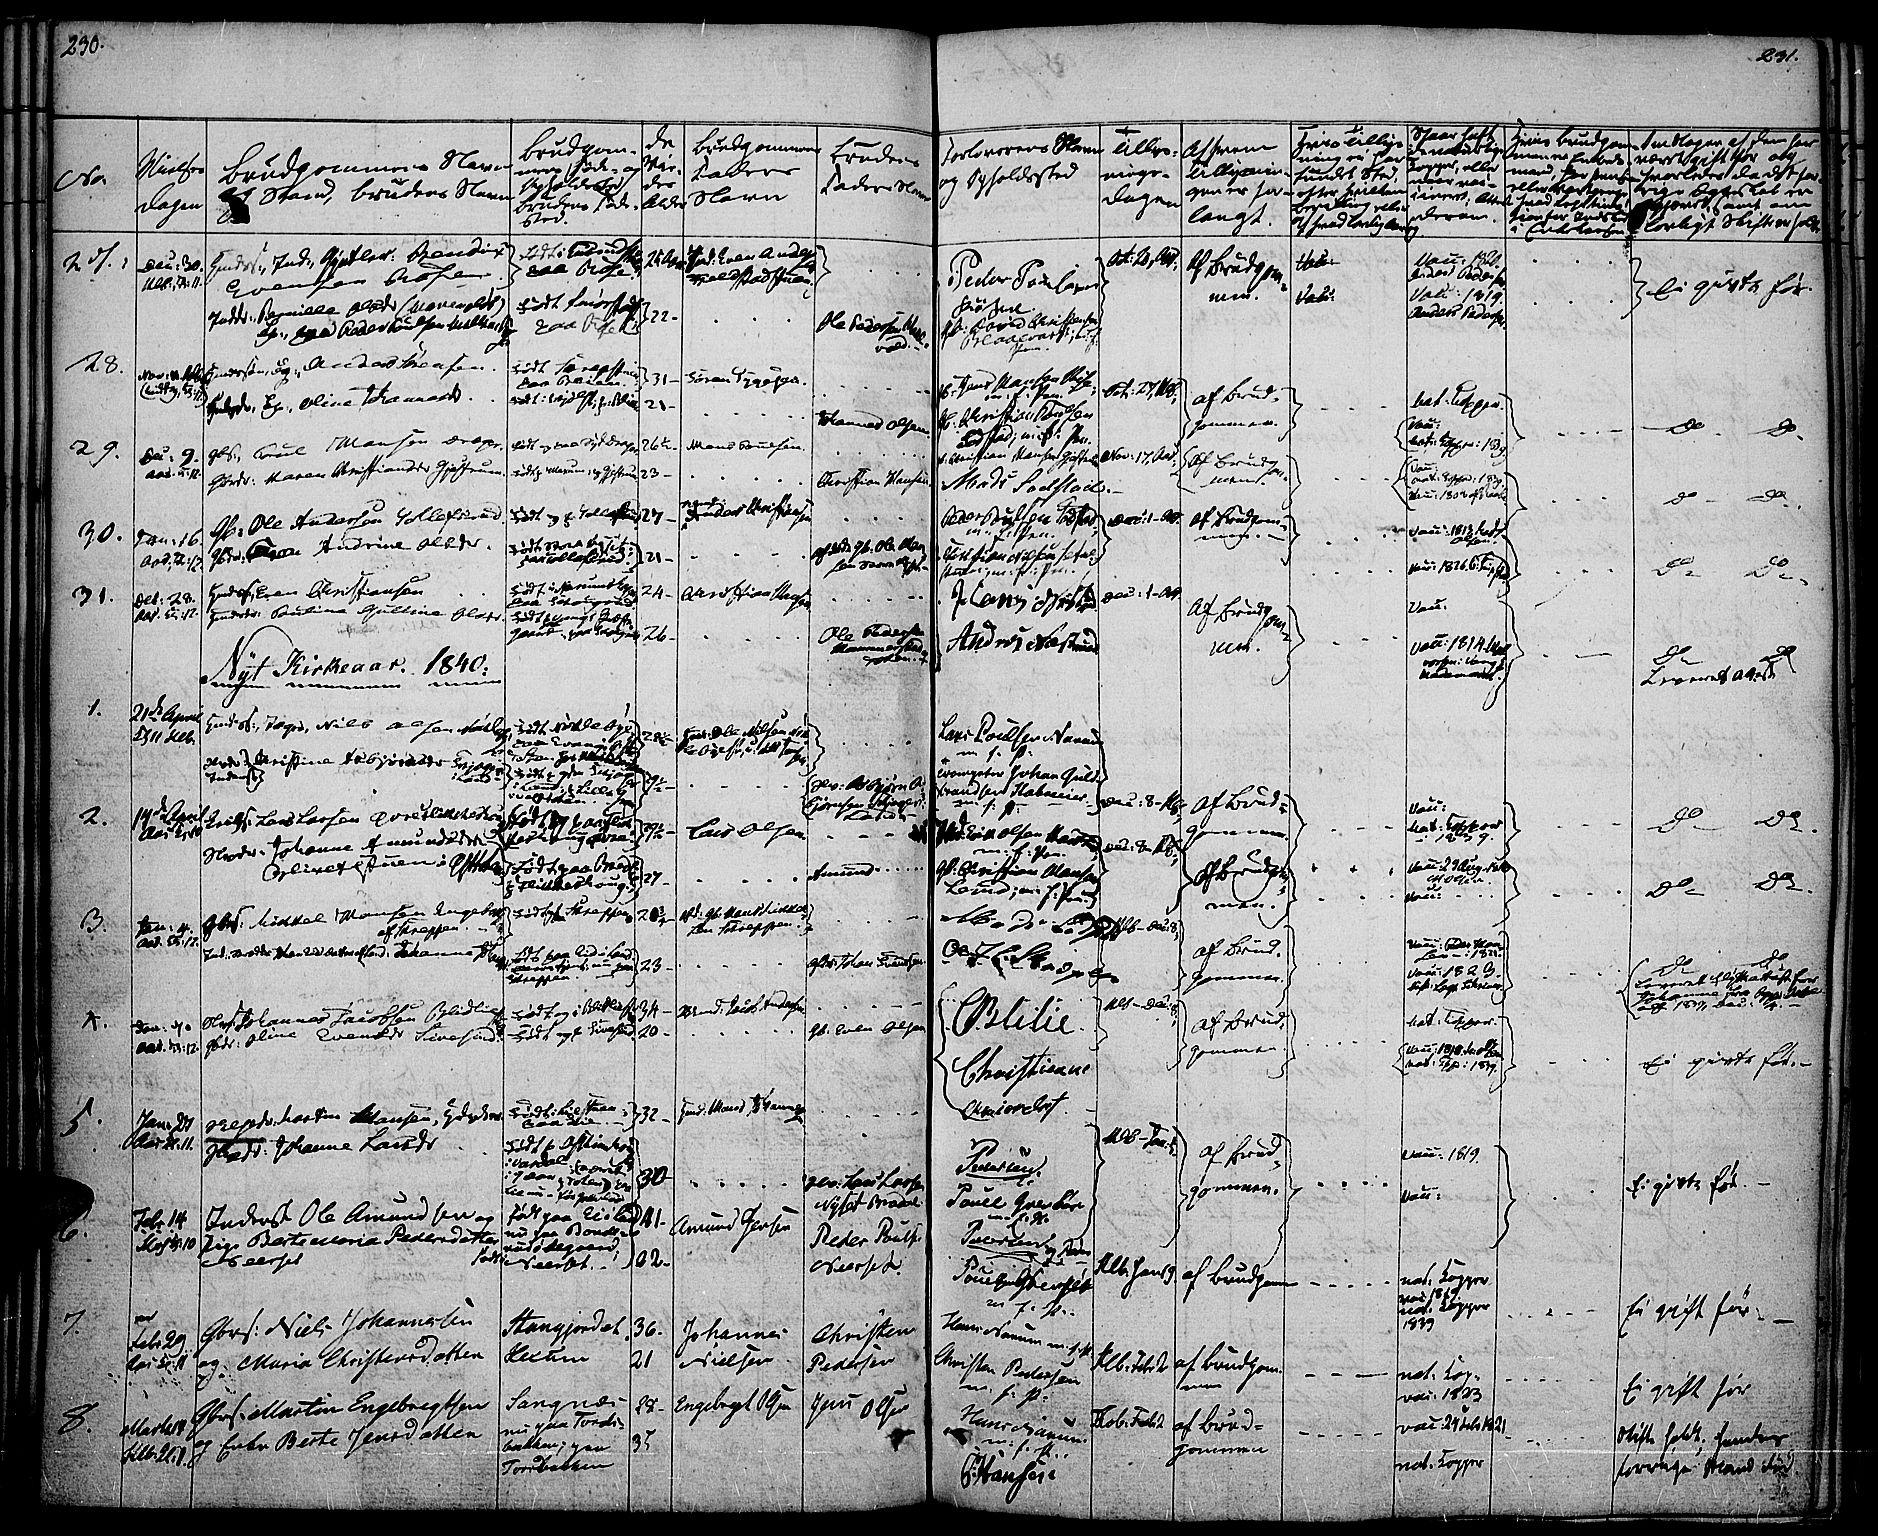 SAH, Vestre Toten prestekontor, H/Ha/Haa/L0003: Ministerialbok nr. 3, 1836-1843, s. 230-231